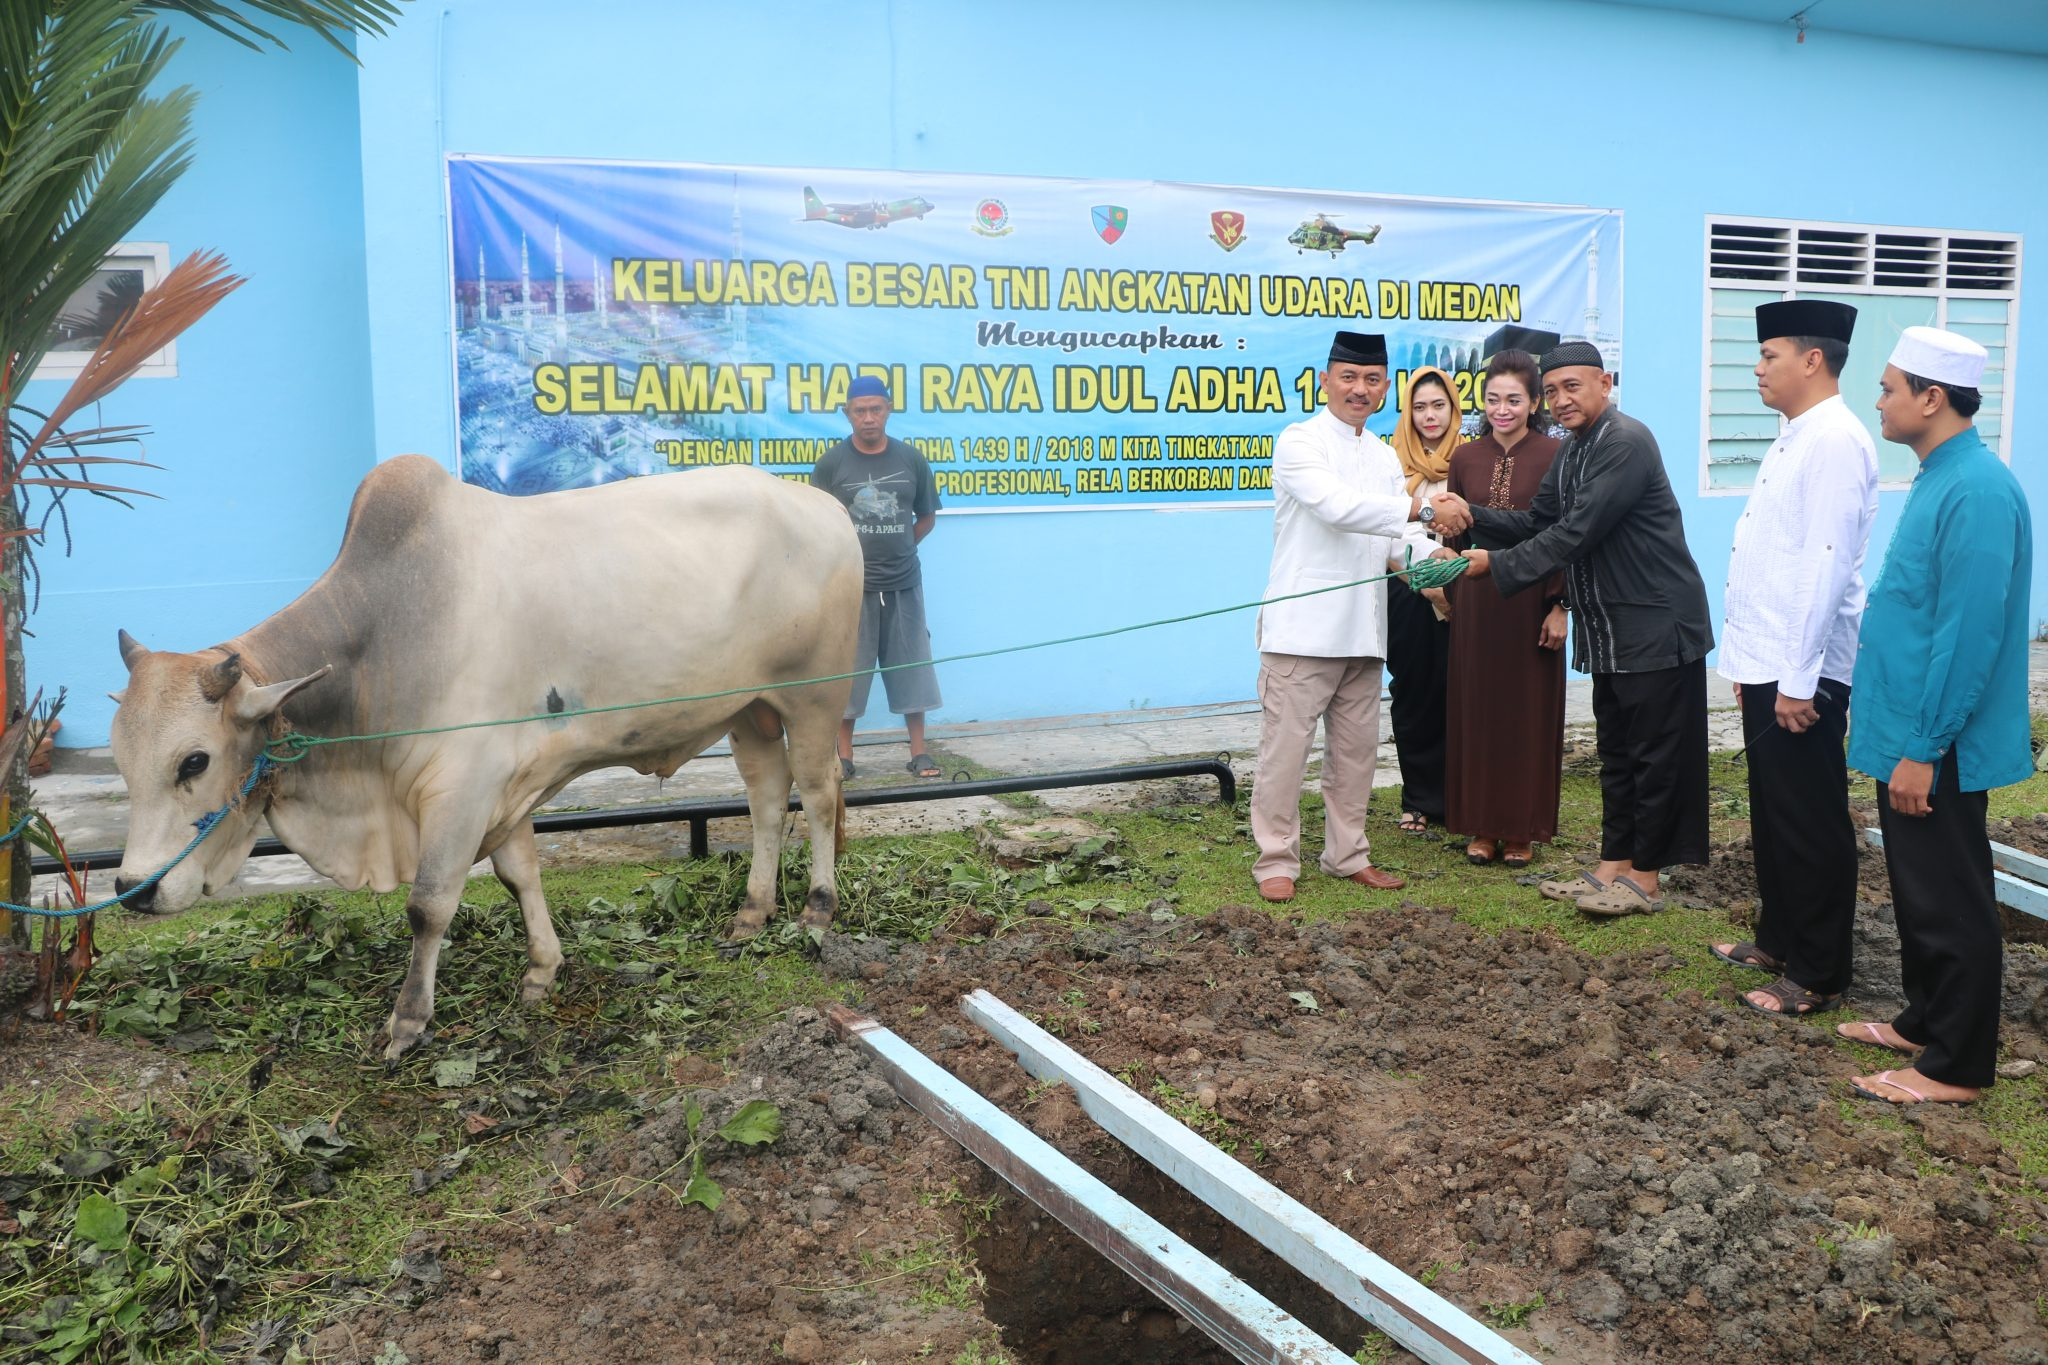 Danlanud Soewondo Menyerahkan Hewan Qurban Kepada Panitia